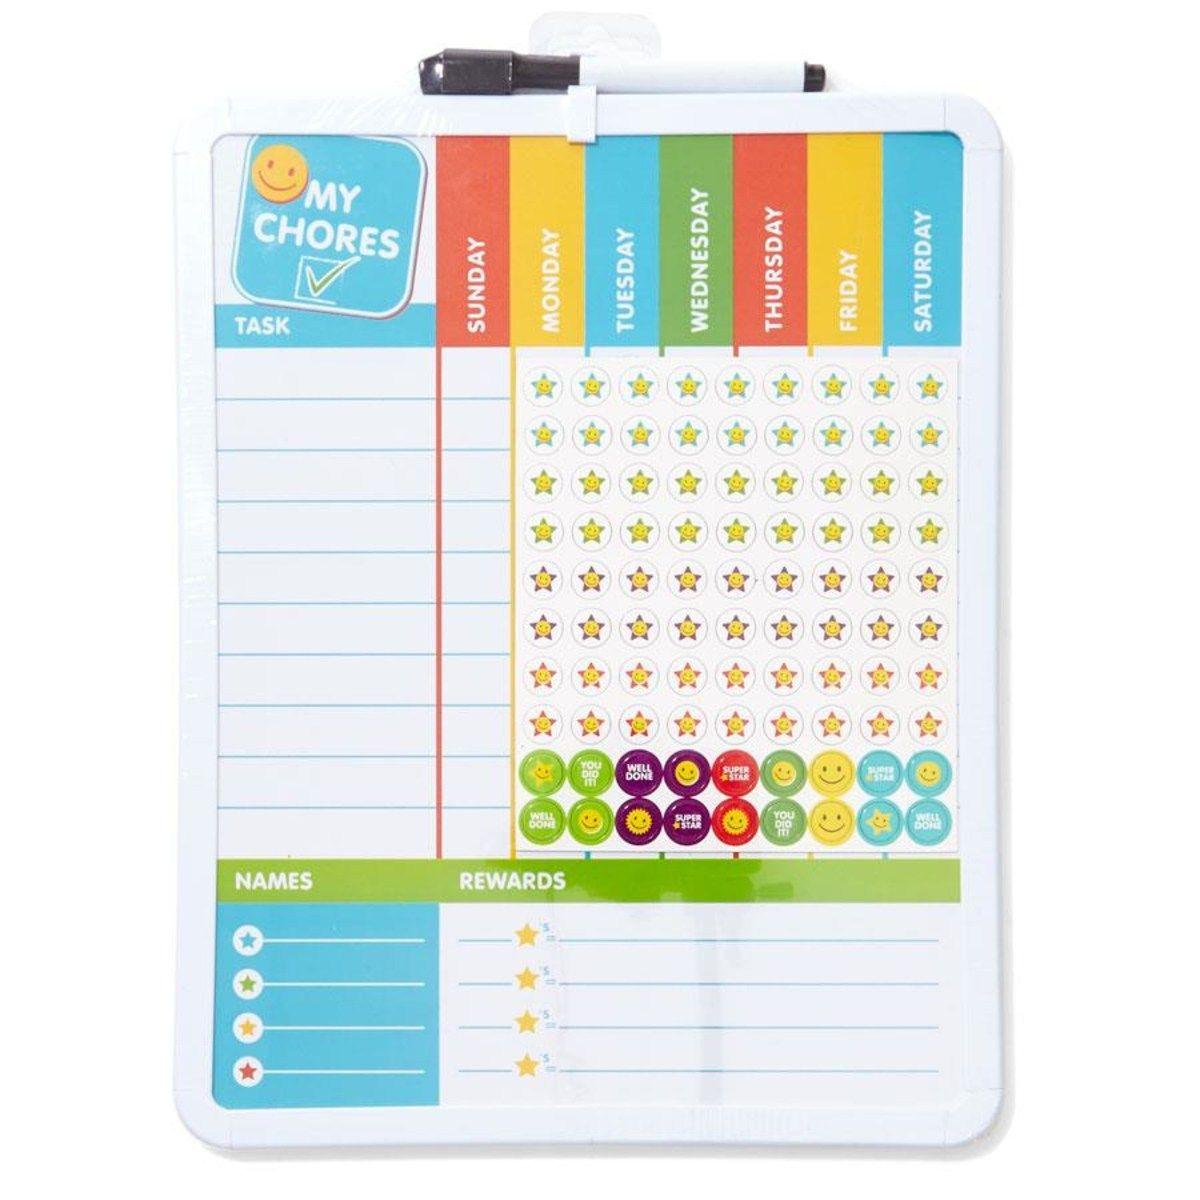 Budget chore chart from Kmart Australia. Printable chore